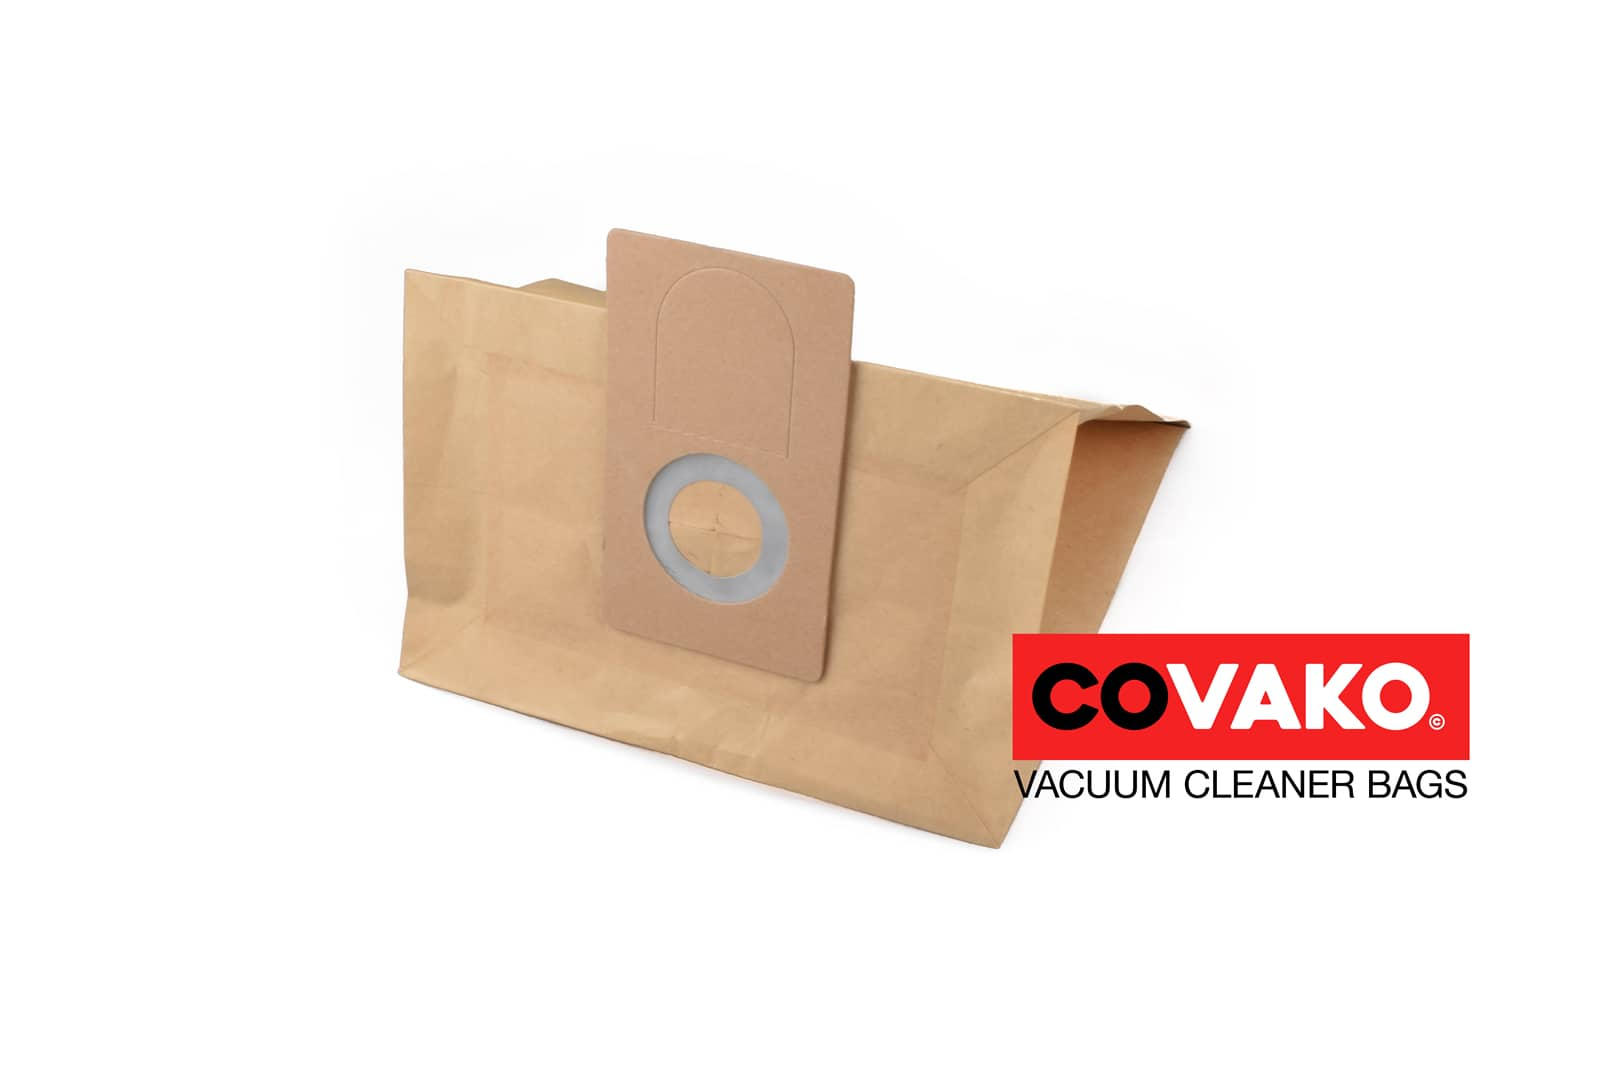 Ivac Major / Paper - Ivac vacuum cleaner bags